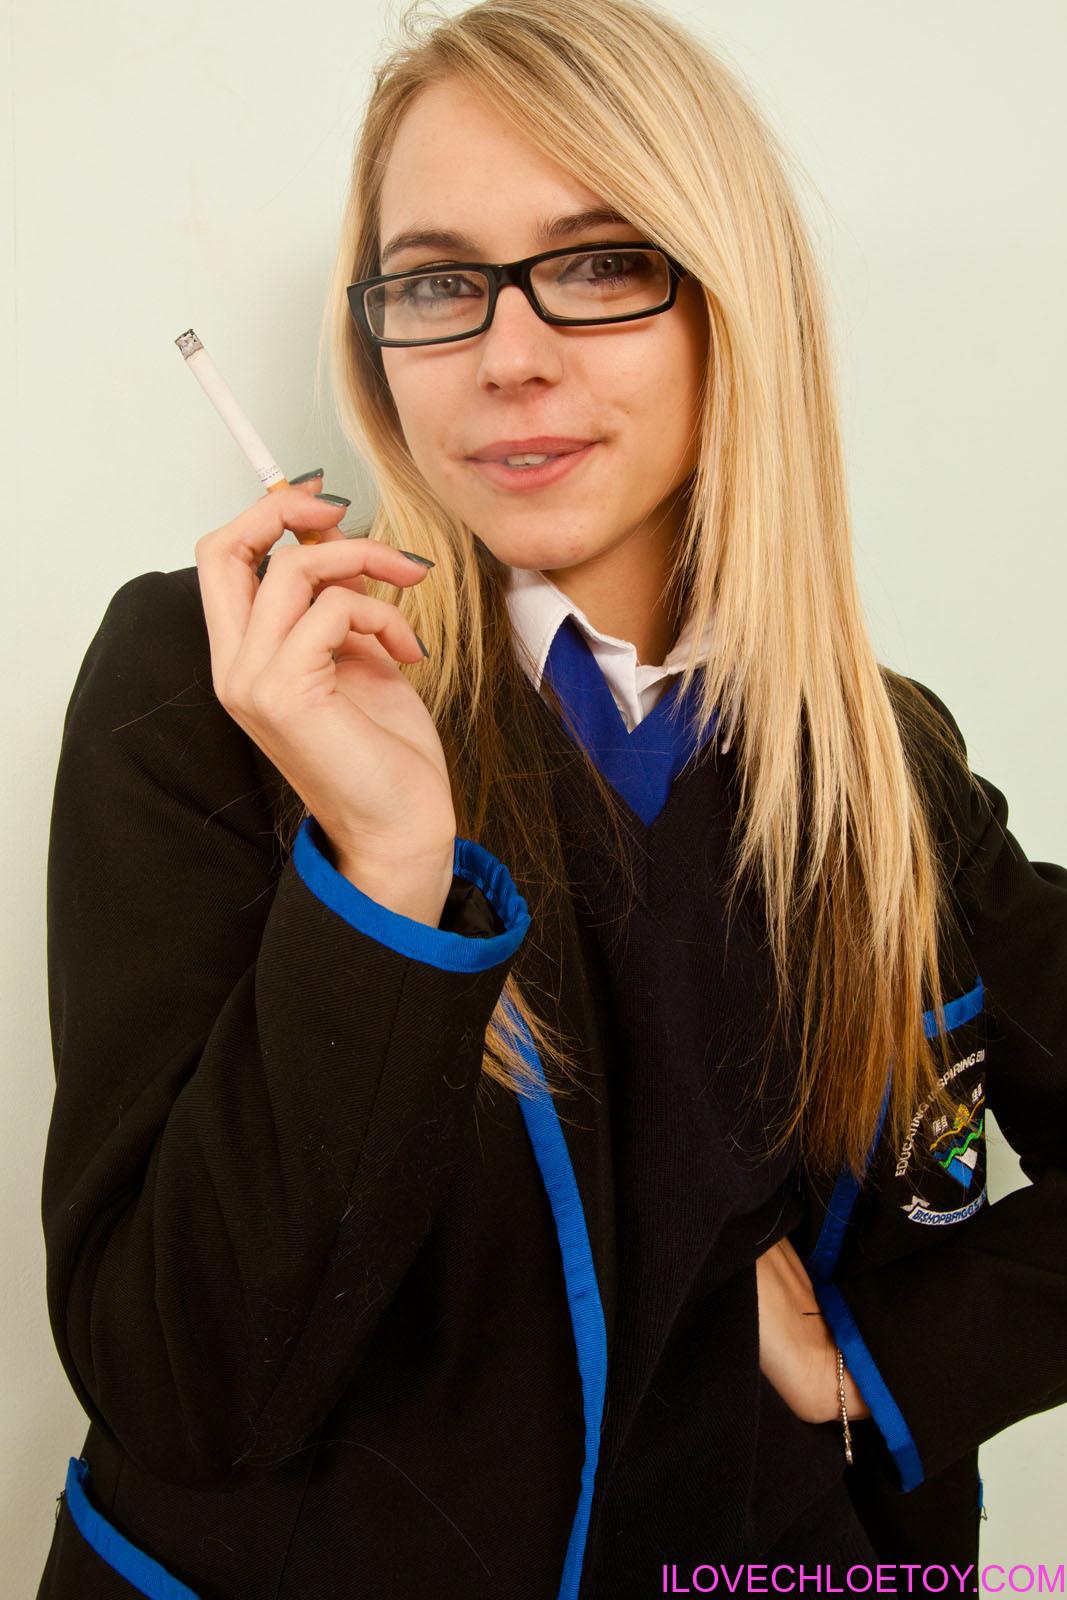 Chloe Toy Blue School Girl Smoking 137533